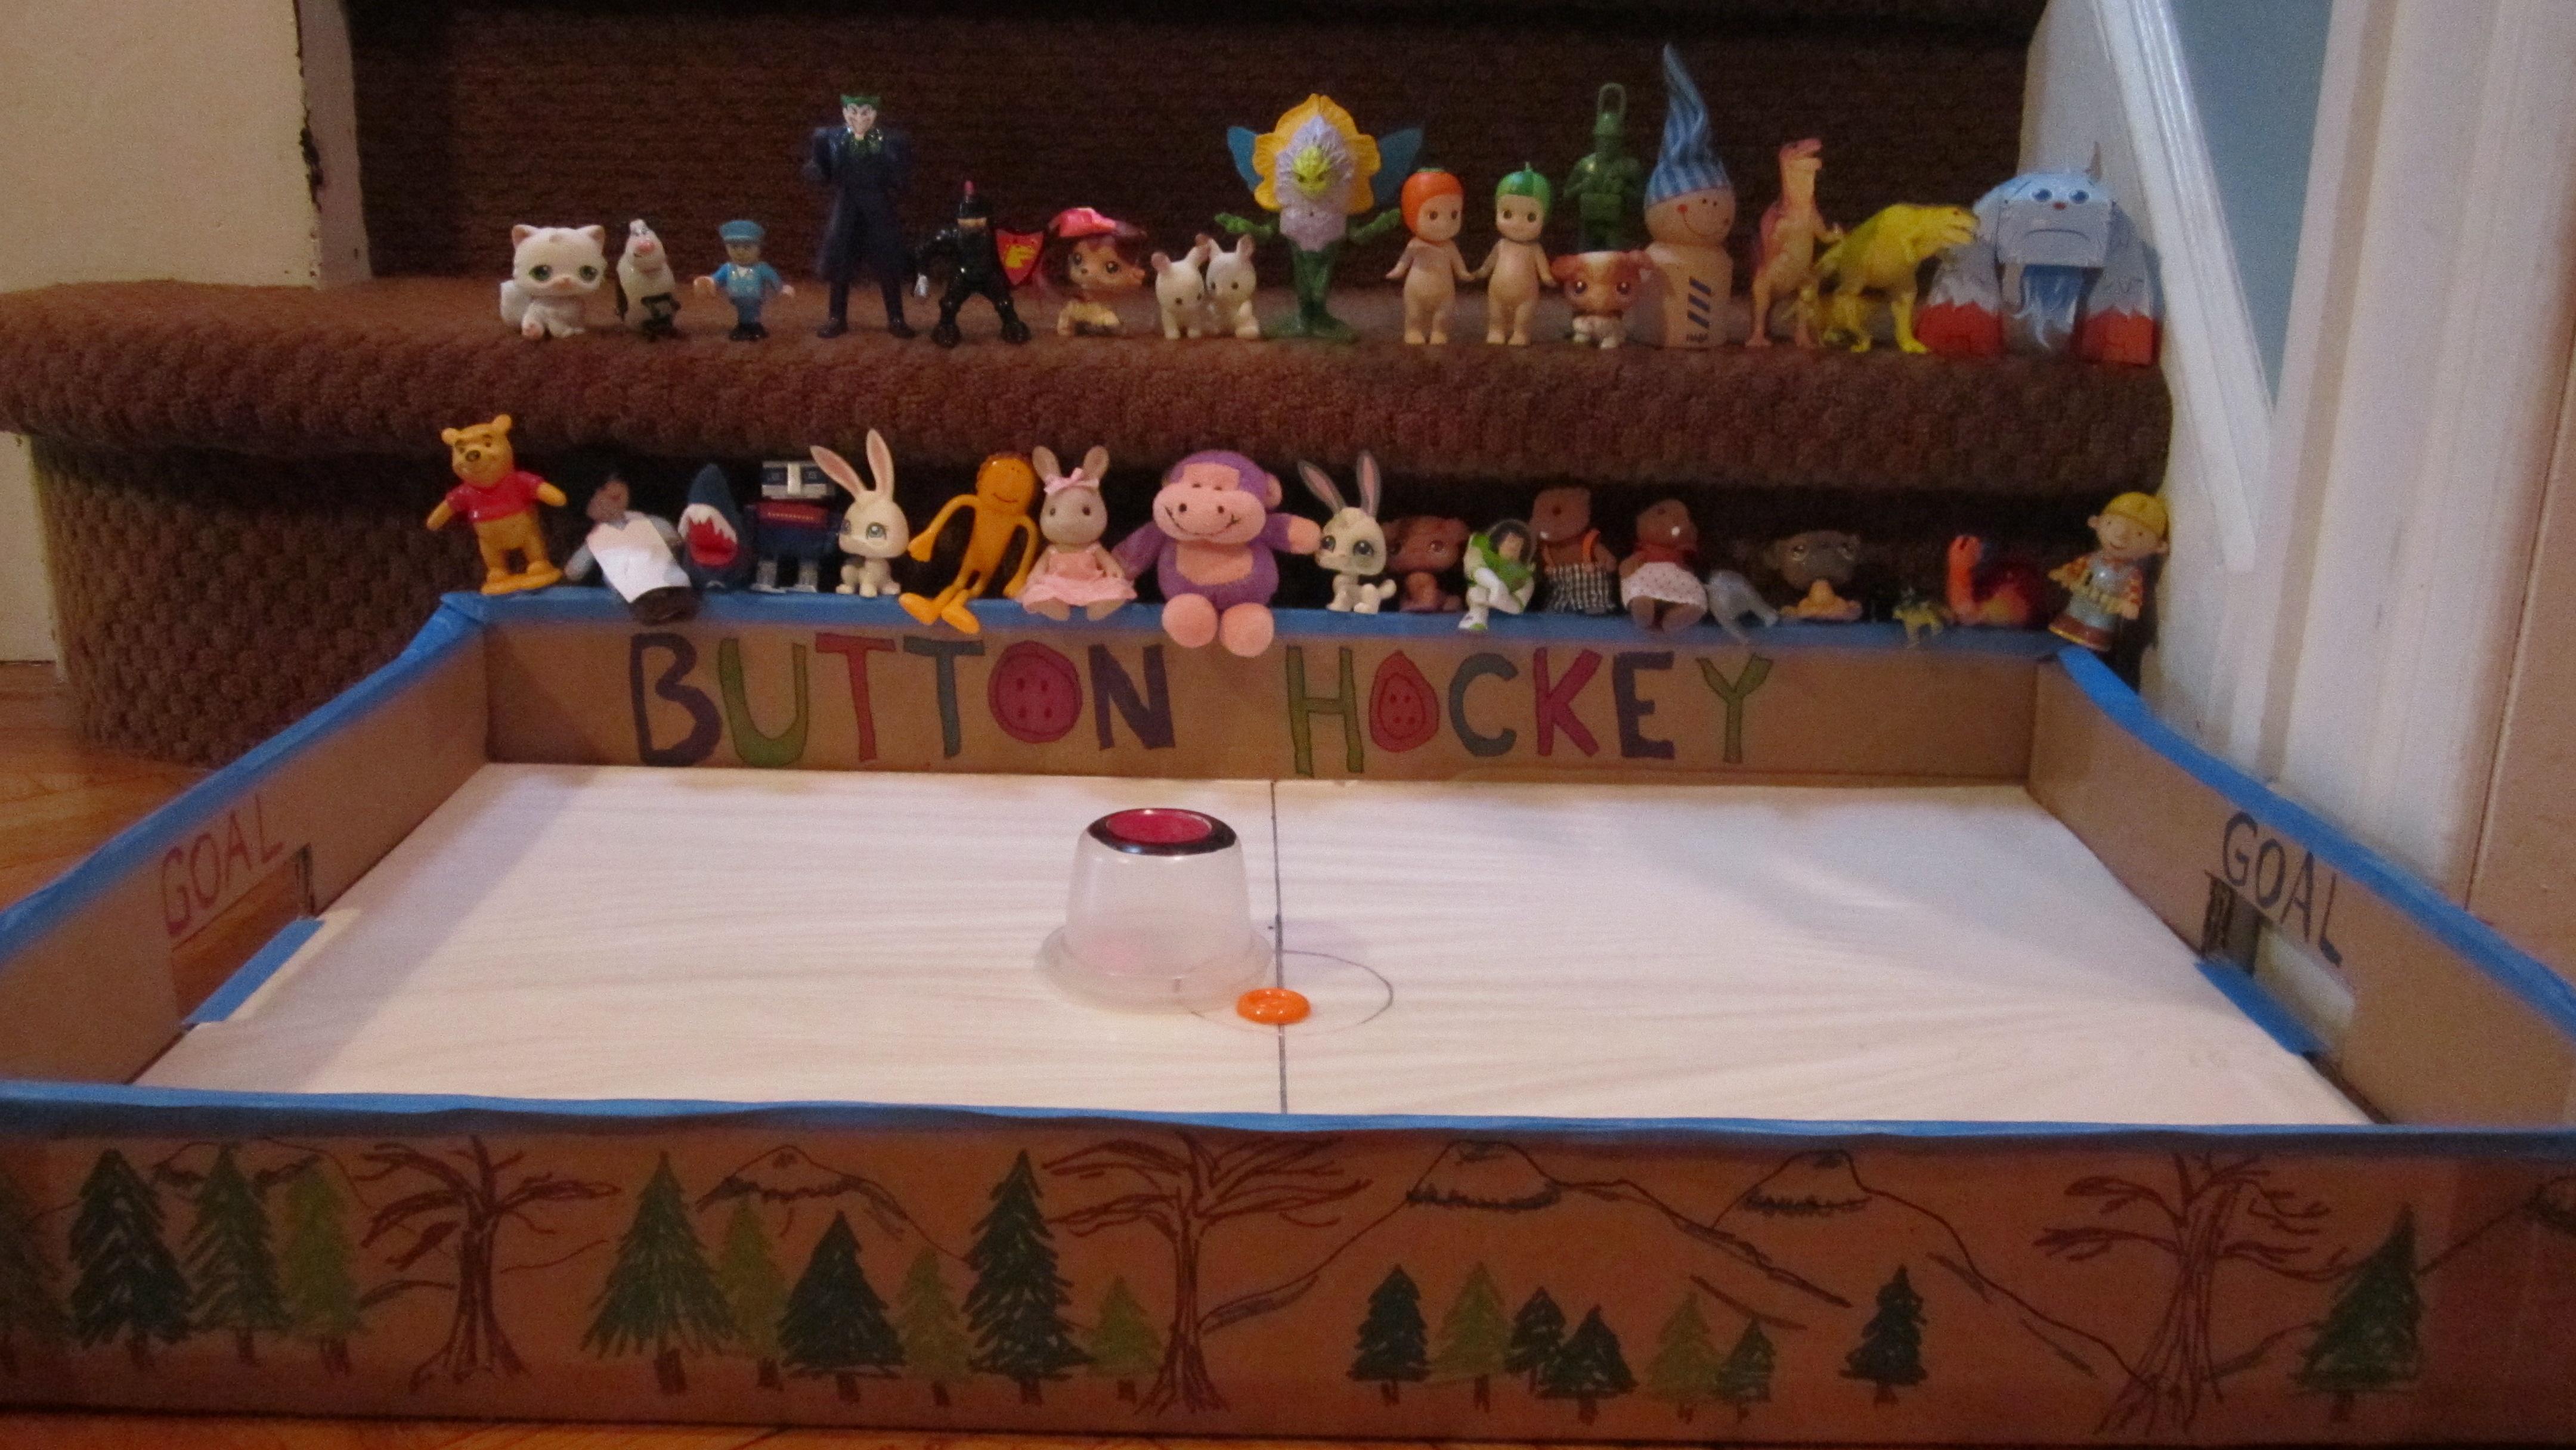 Button Hockey Game Homemade Fun Hockeygods